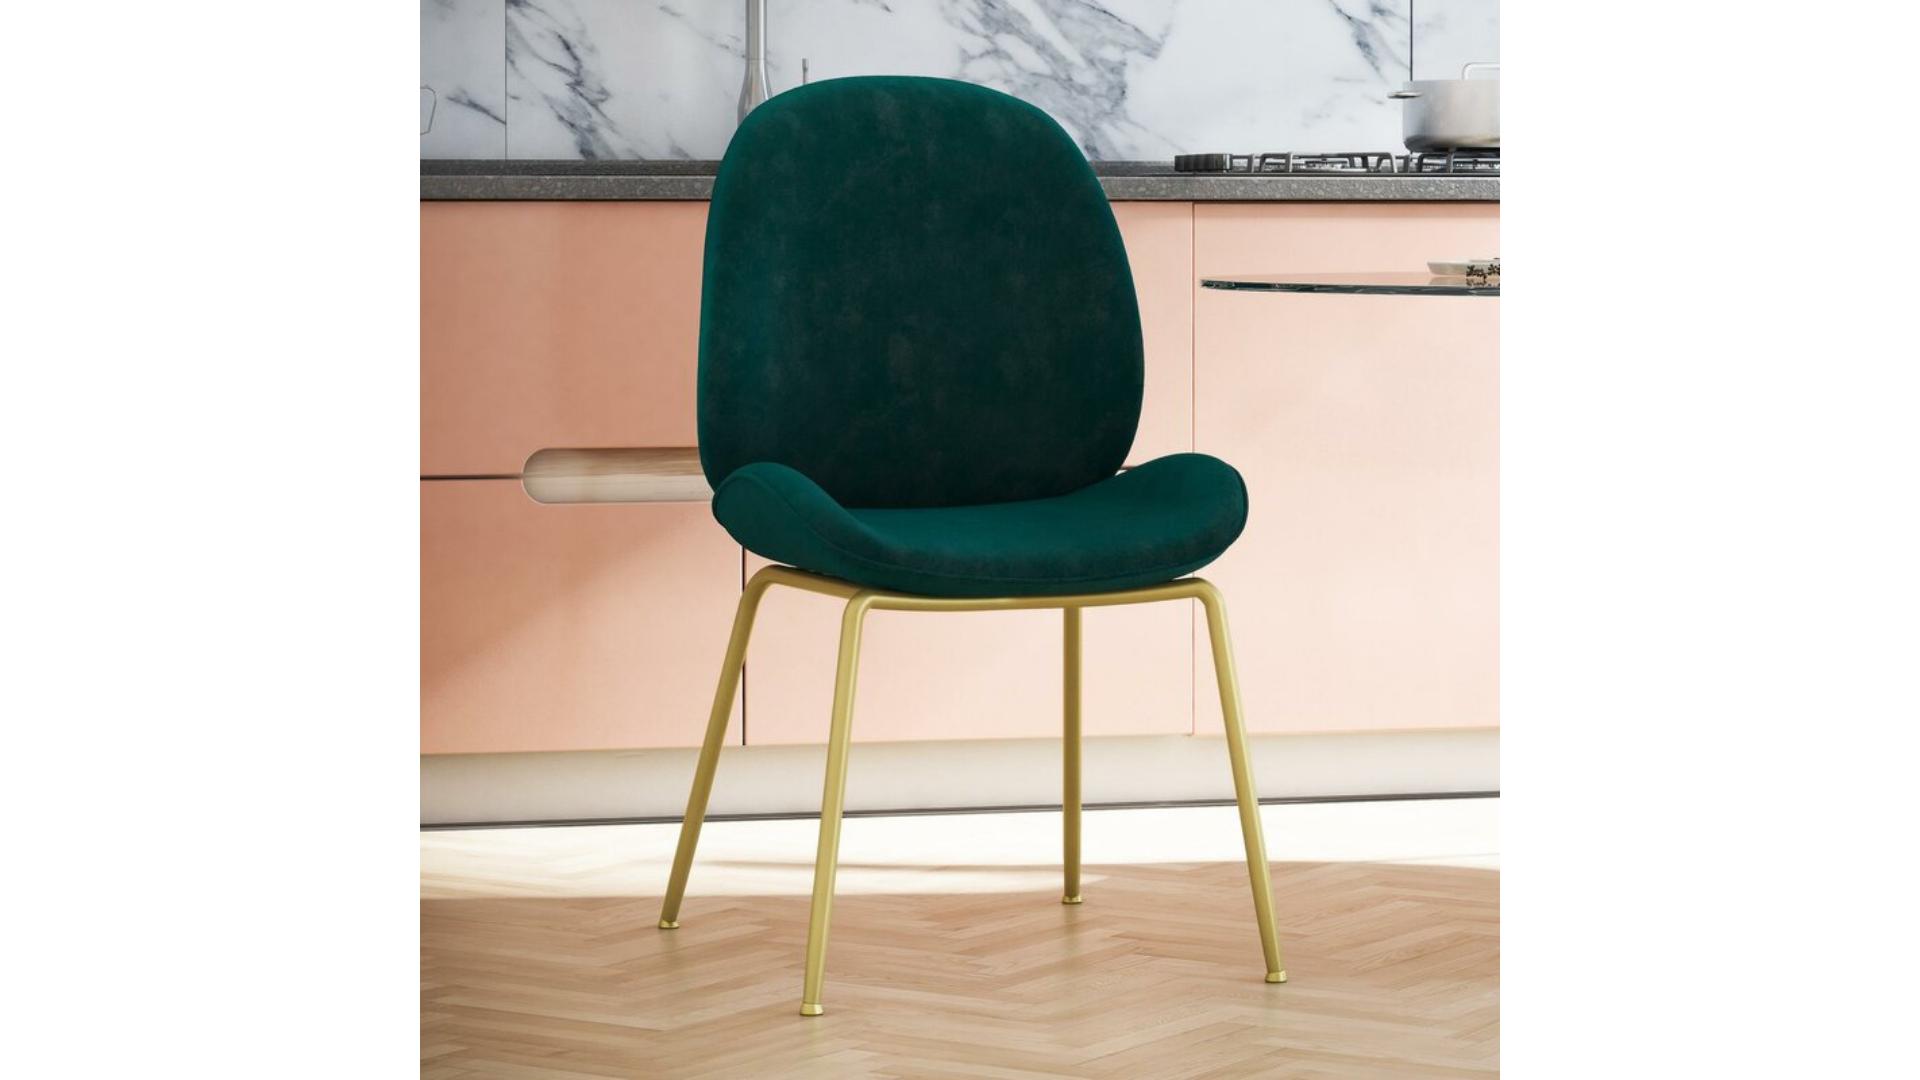 Cosmopolitan best desk chair with no wheels